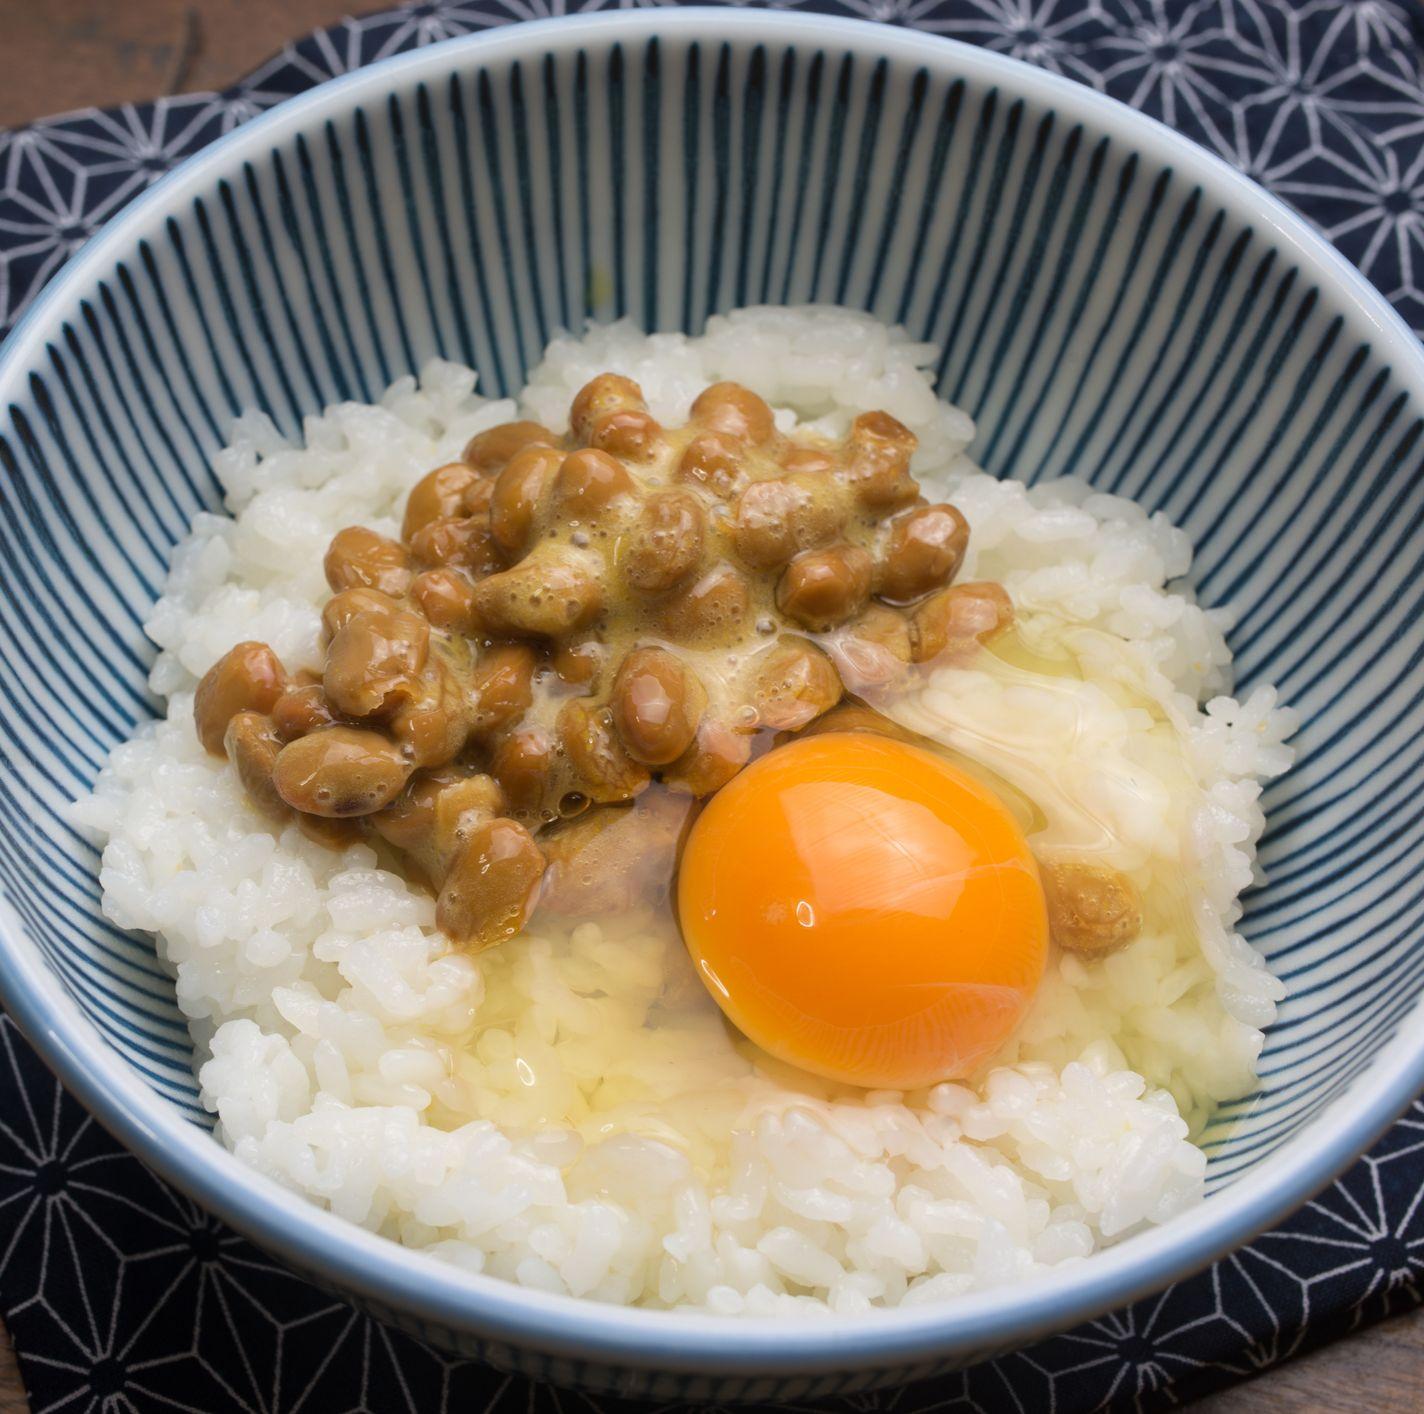 Traditional breakfast of Japan. Nattō gohan